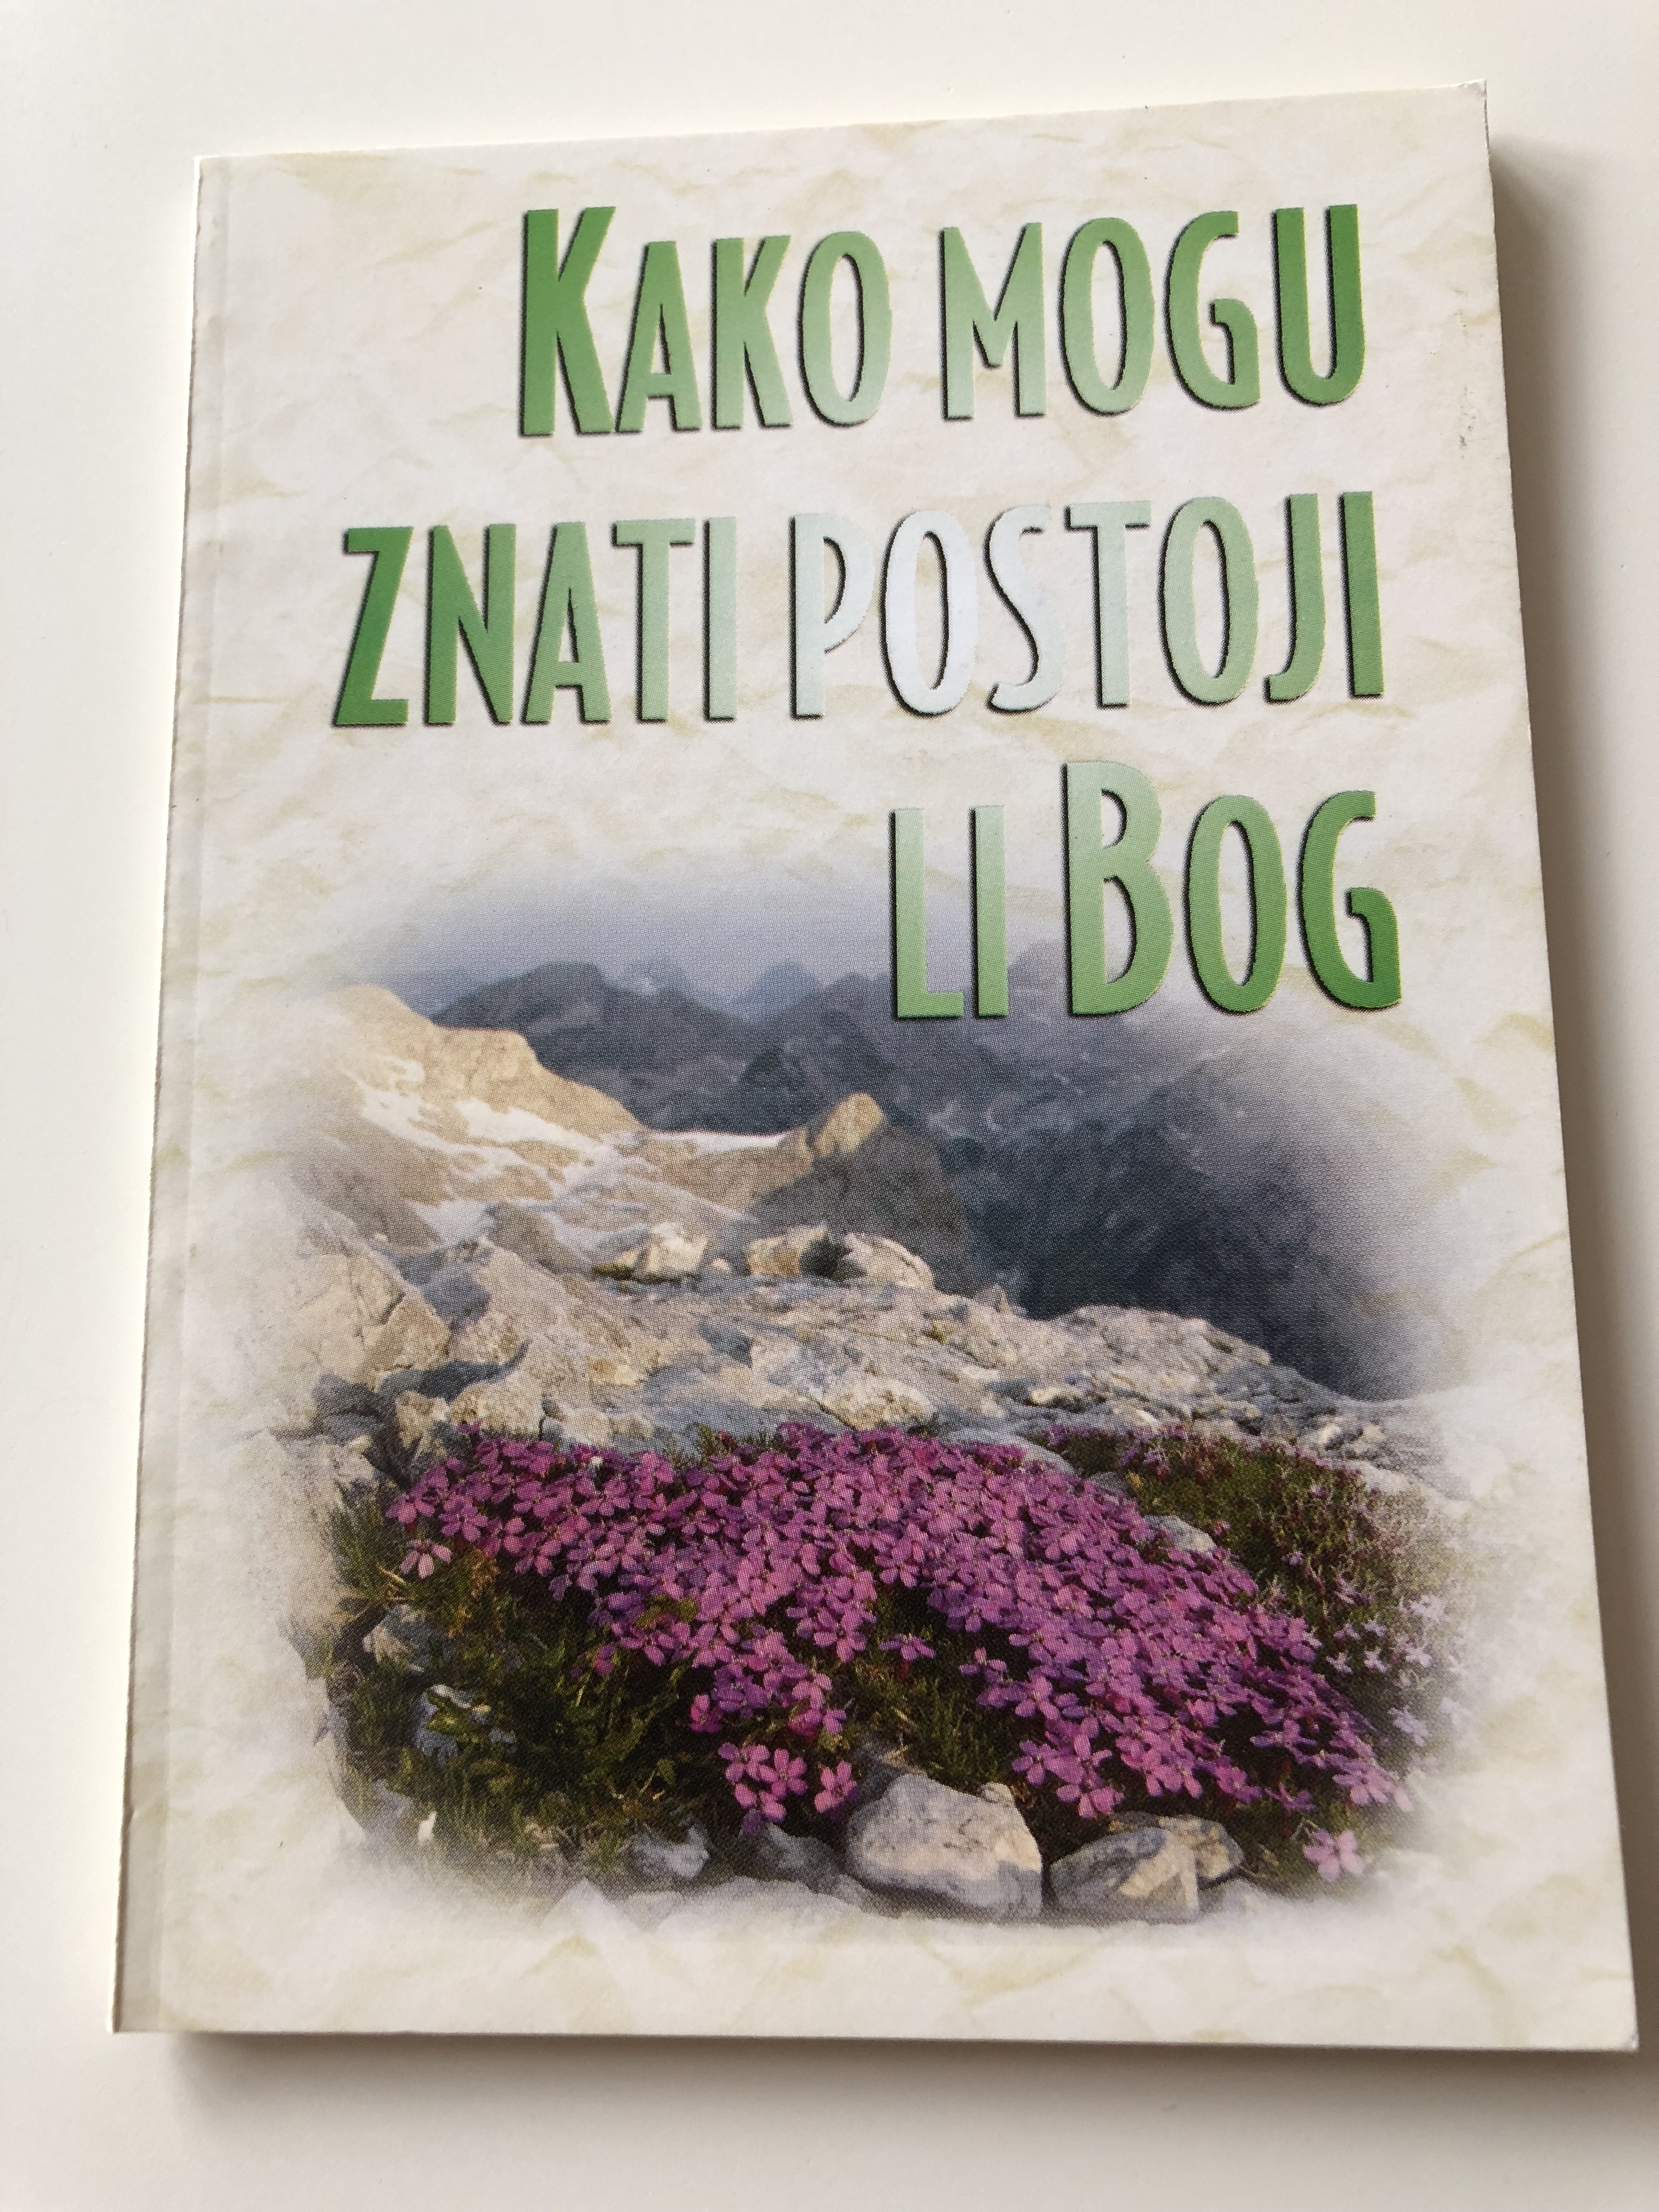 kako-mogu-znati-postoji-li-bog-croatian-language-booklet-how-can-i-know-there-is-a-god-1-.jpg